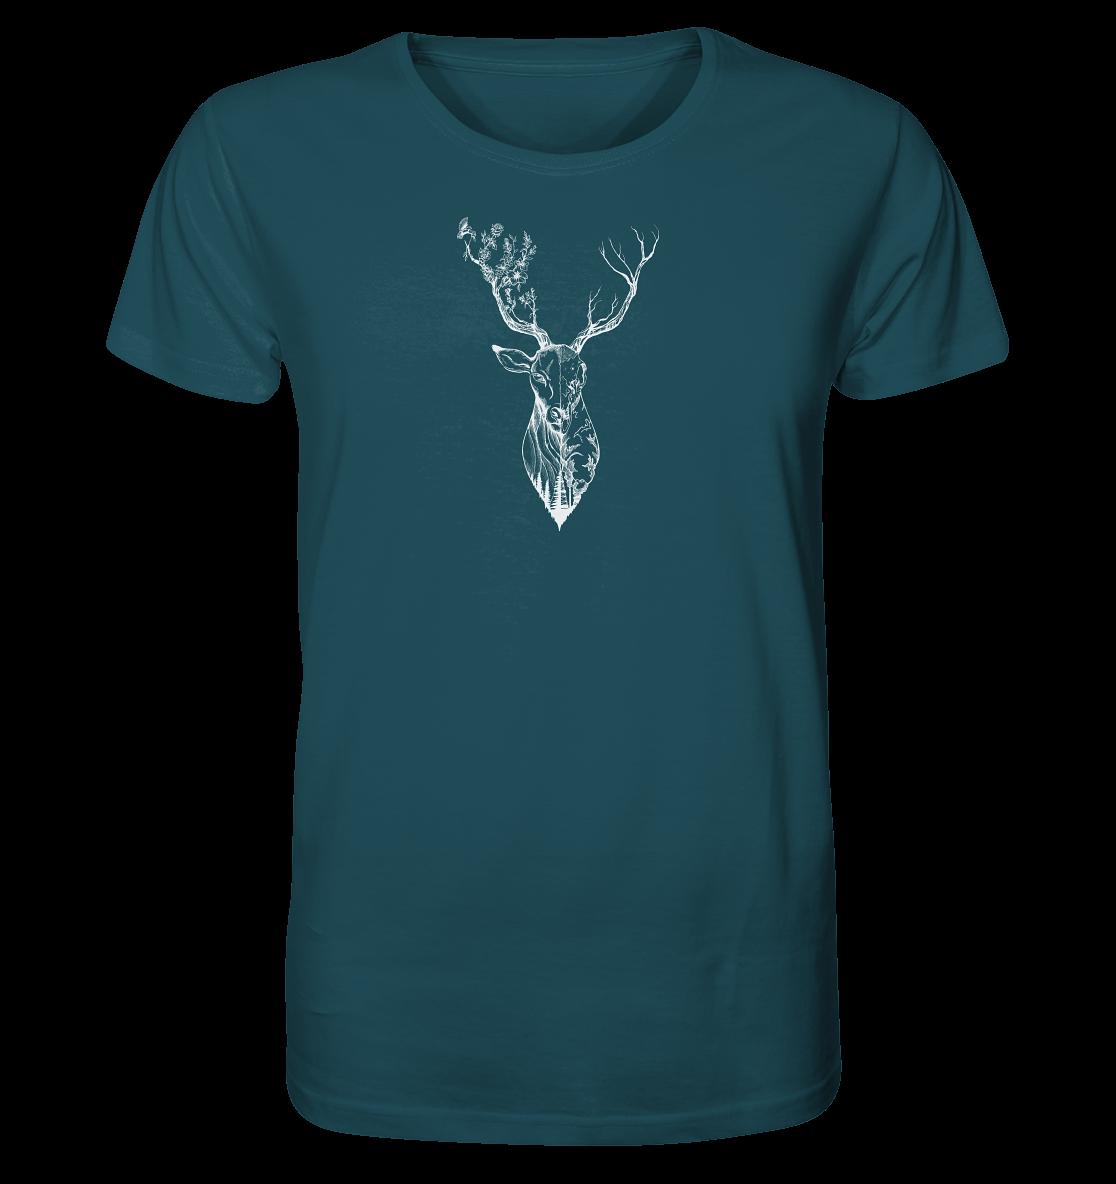 front-organic-shirt-204d59-1116x-7.png